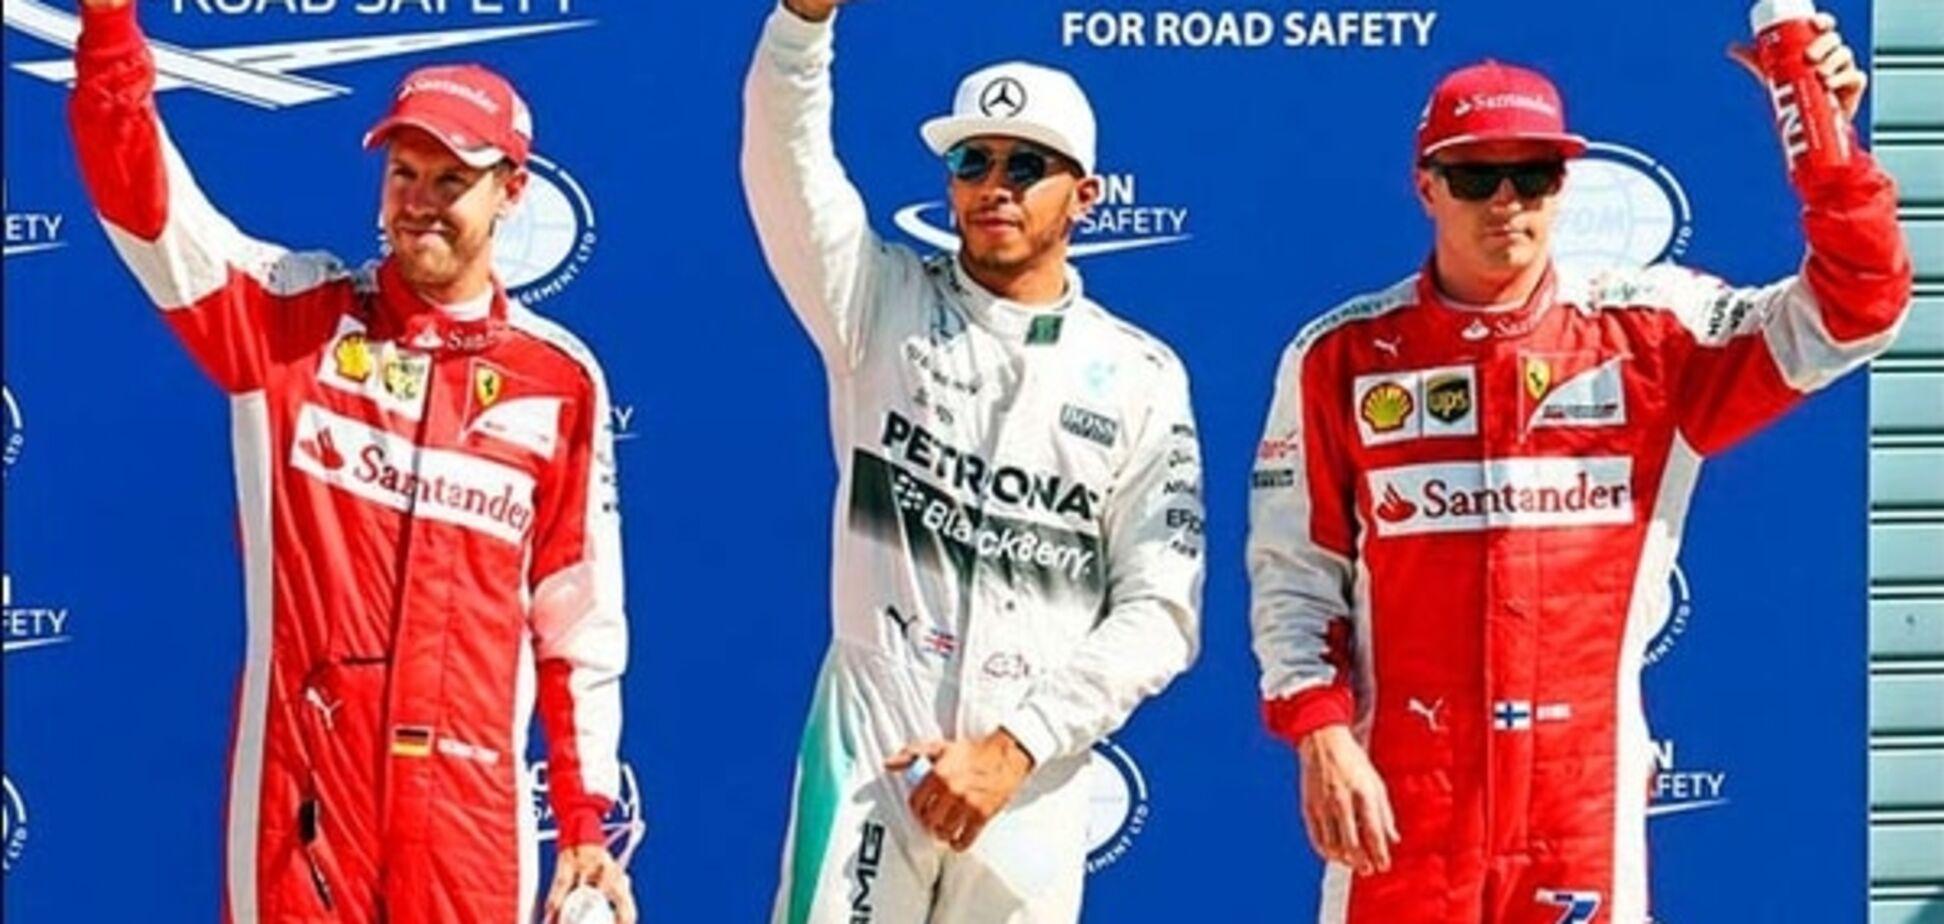 Ferrari ефектно дали бій Mercedes на кваліфікації Гран-прі Італії